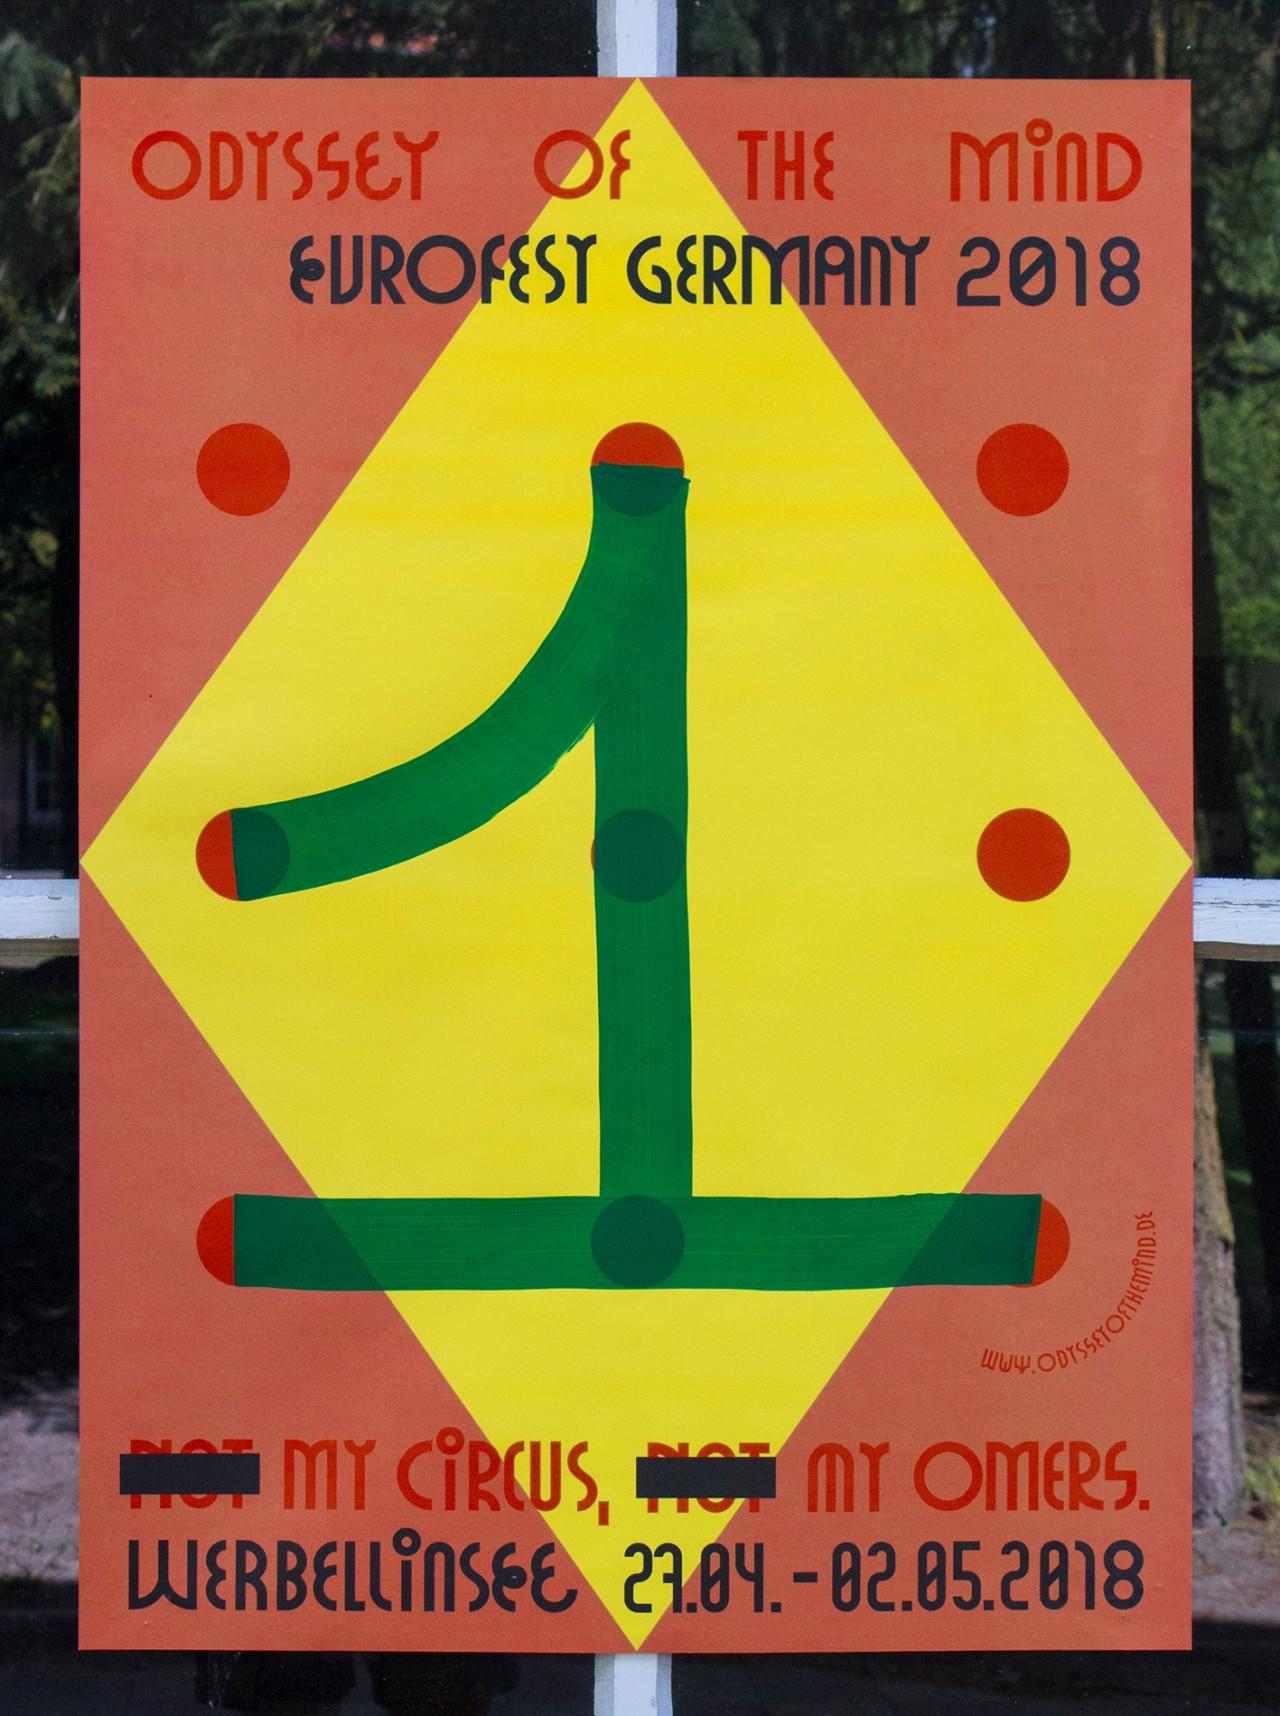 Martin Gnadt — Kommunikationsdesign EUROFEST 2018